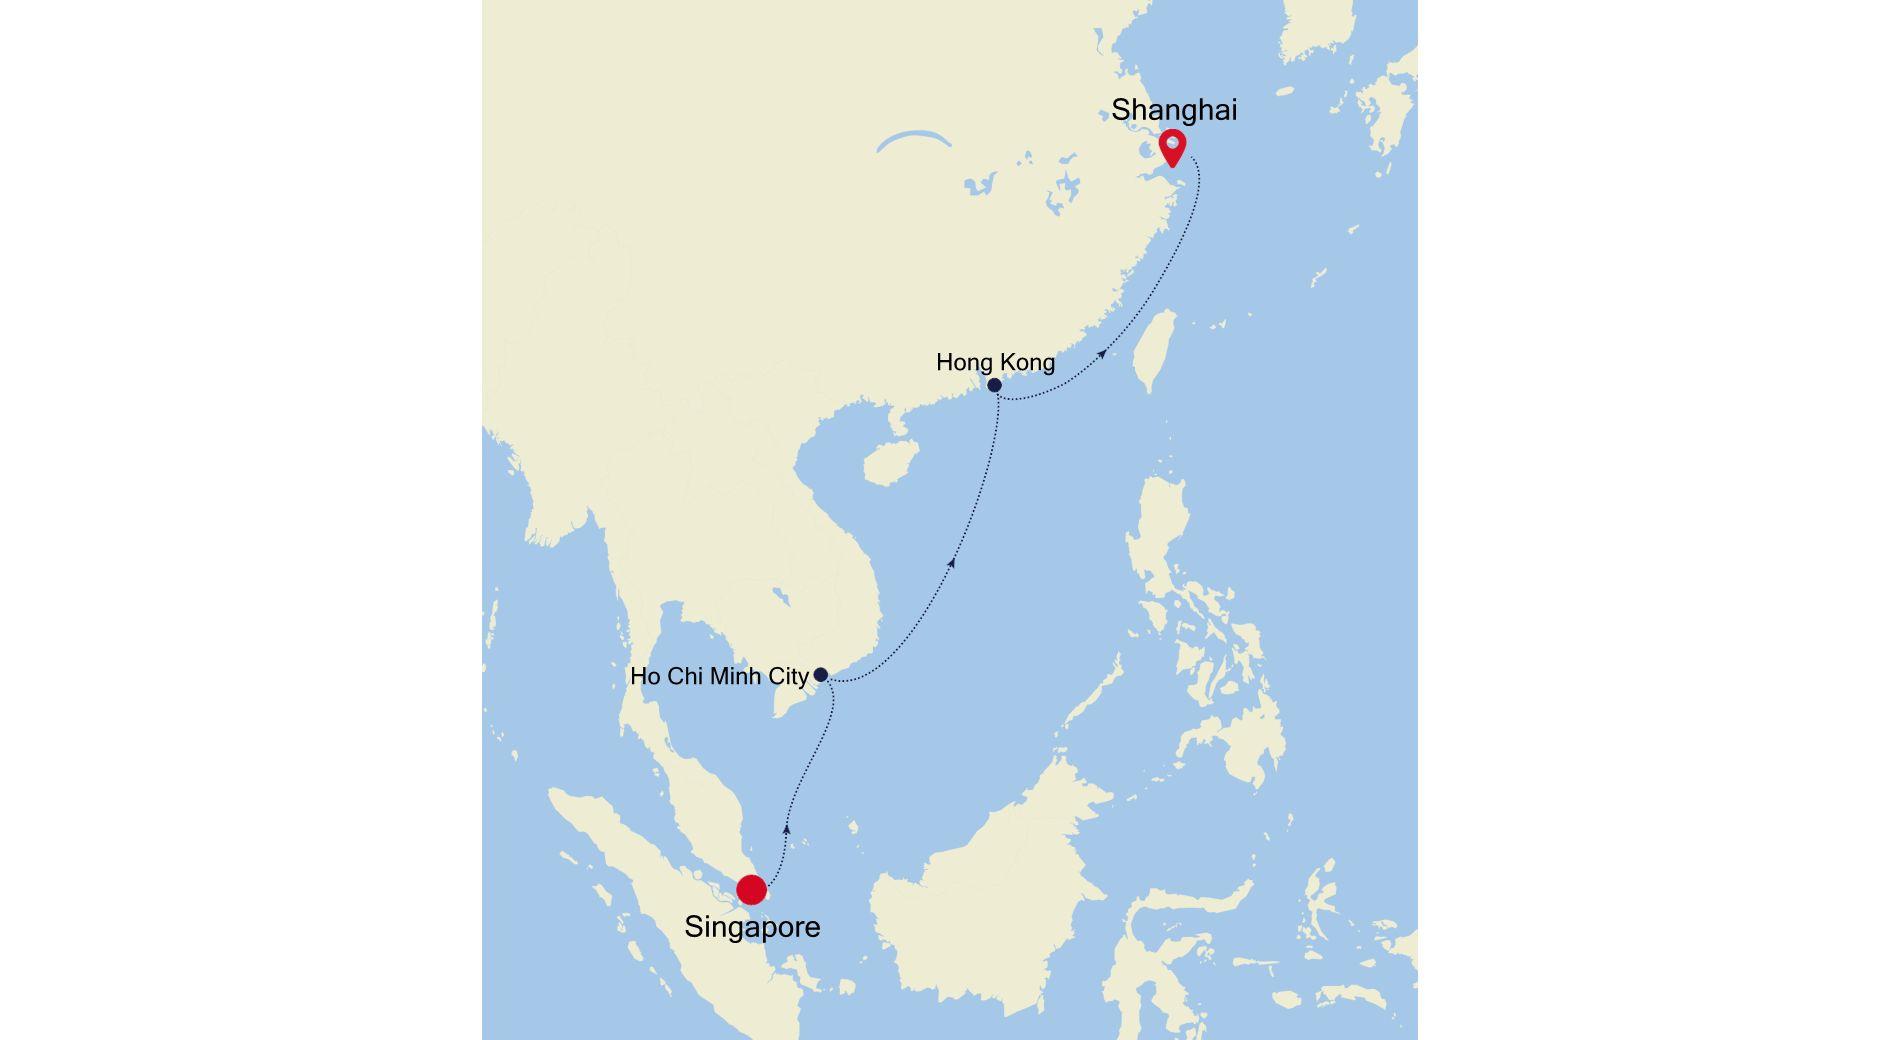 SM220309S12 - Singapore to Shanghai